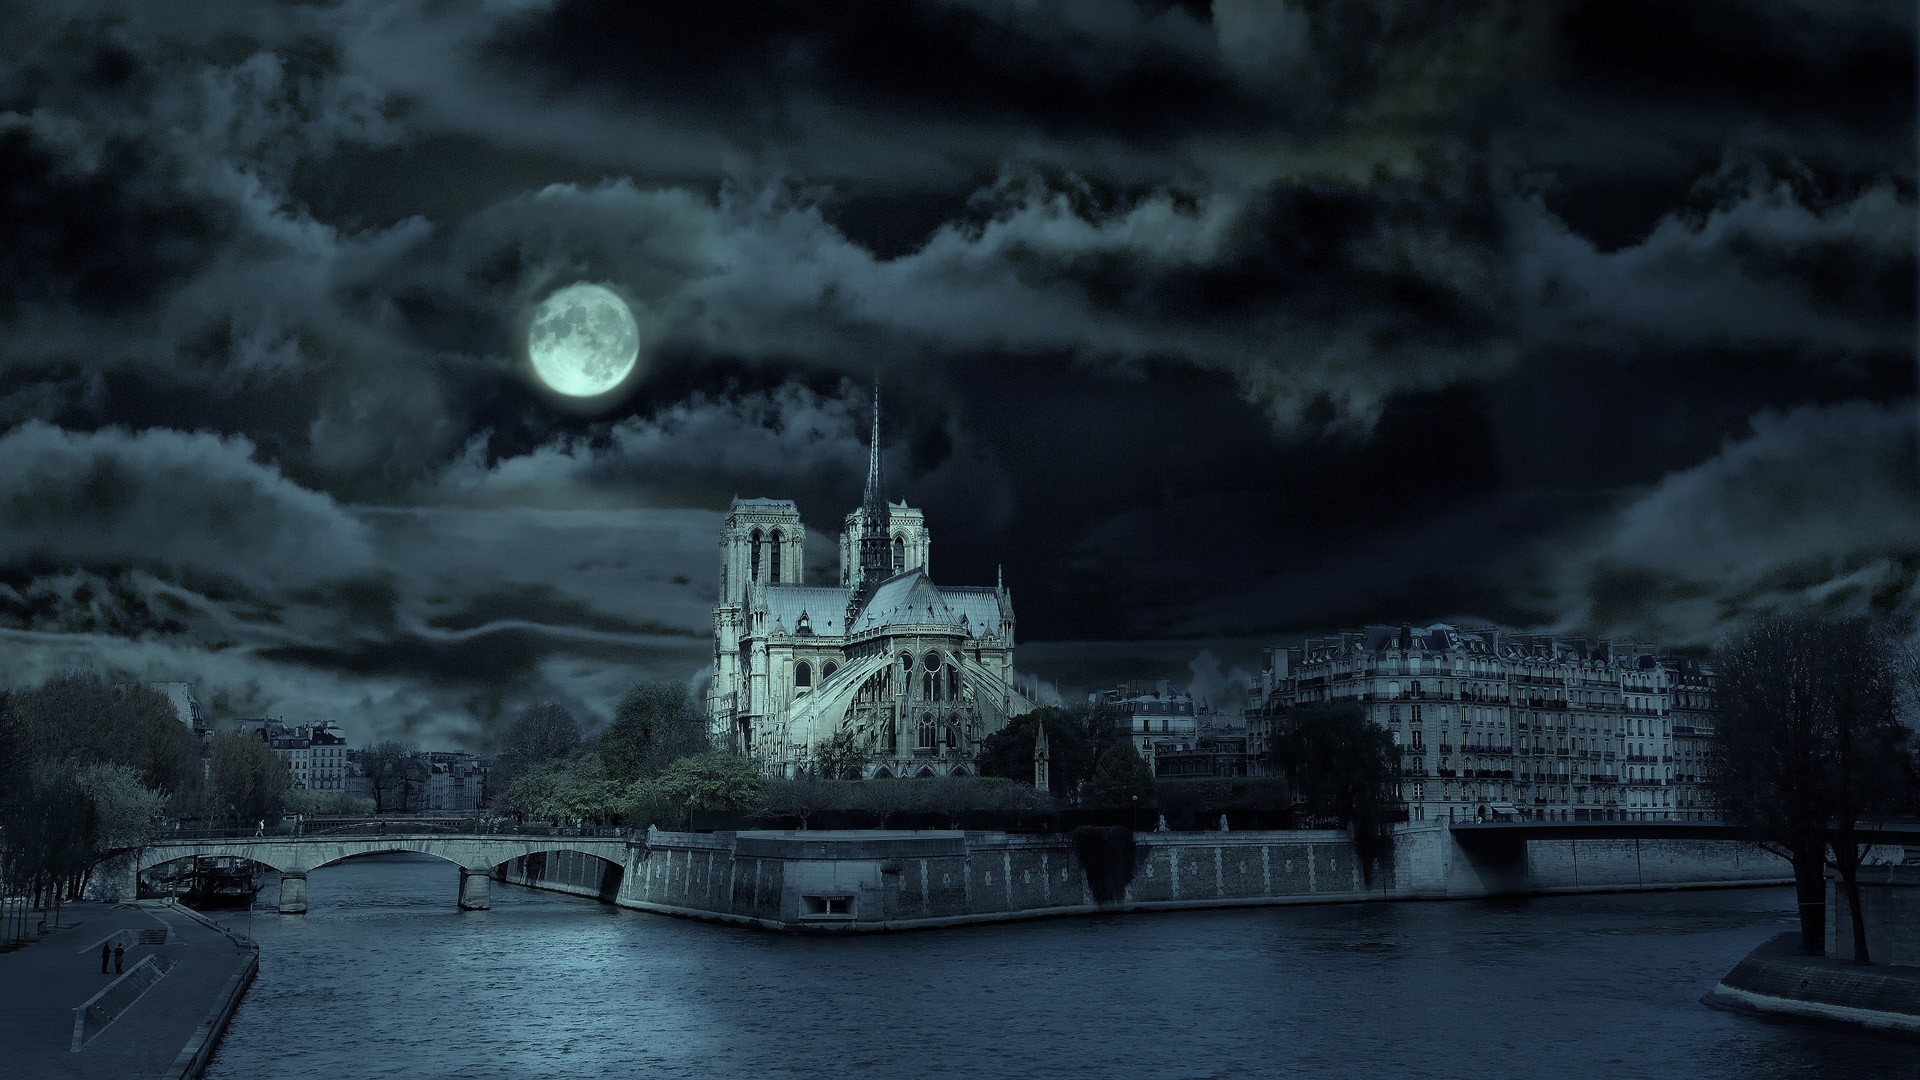 Paris Night Wallpaper 1920x1080 Paris Night France Notre Dame 1920x1080